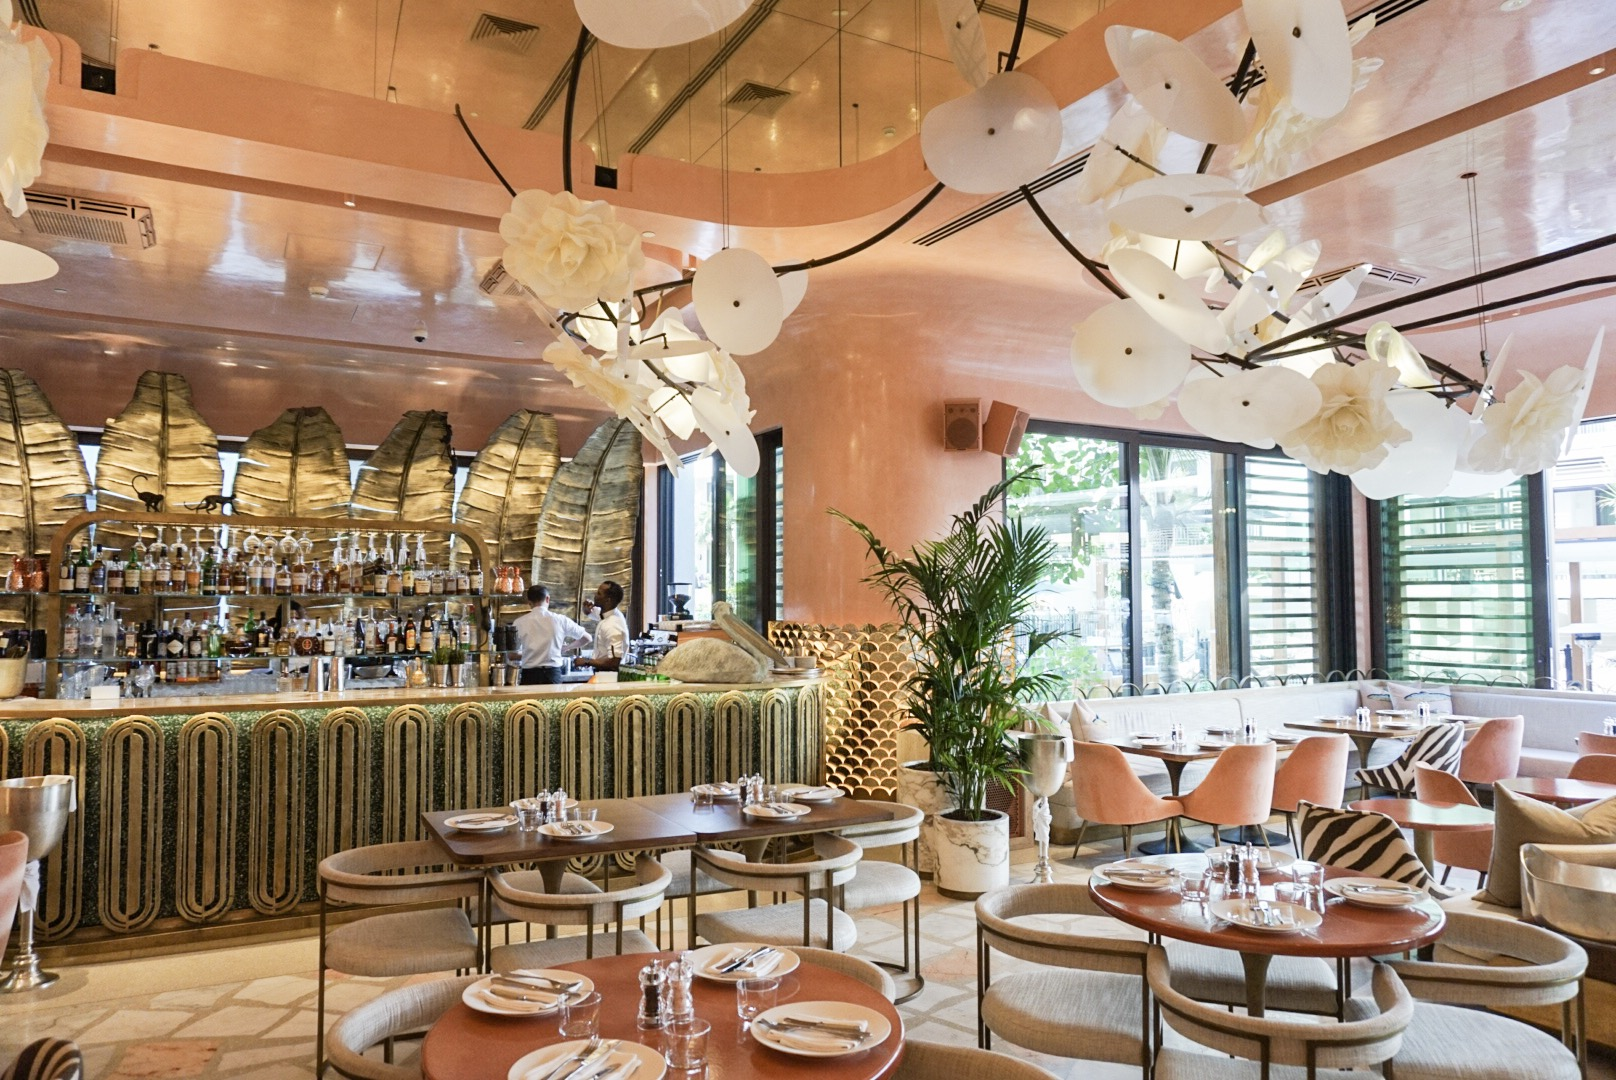 The Cutest Spot In Dubai Flamingo Room By Tashas The